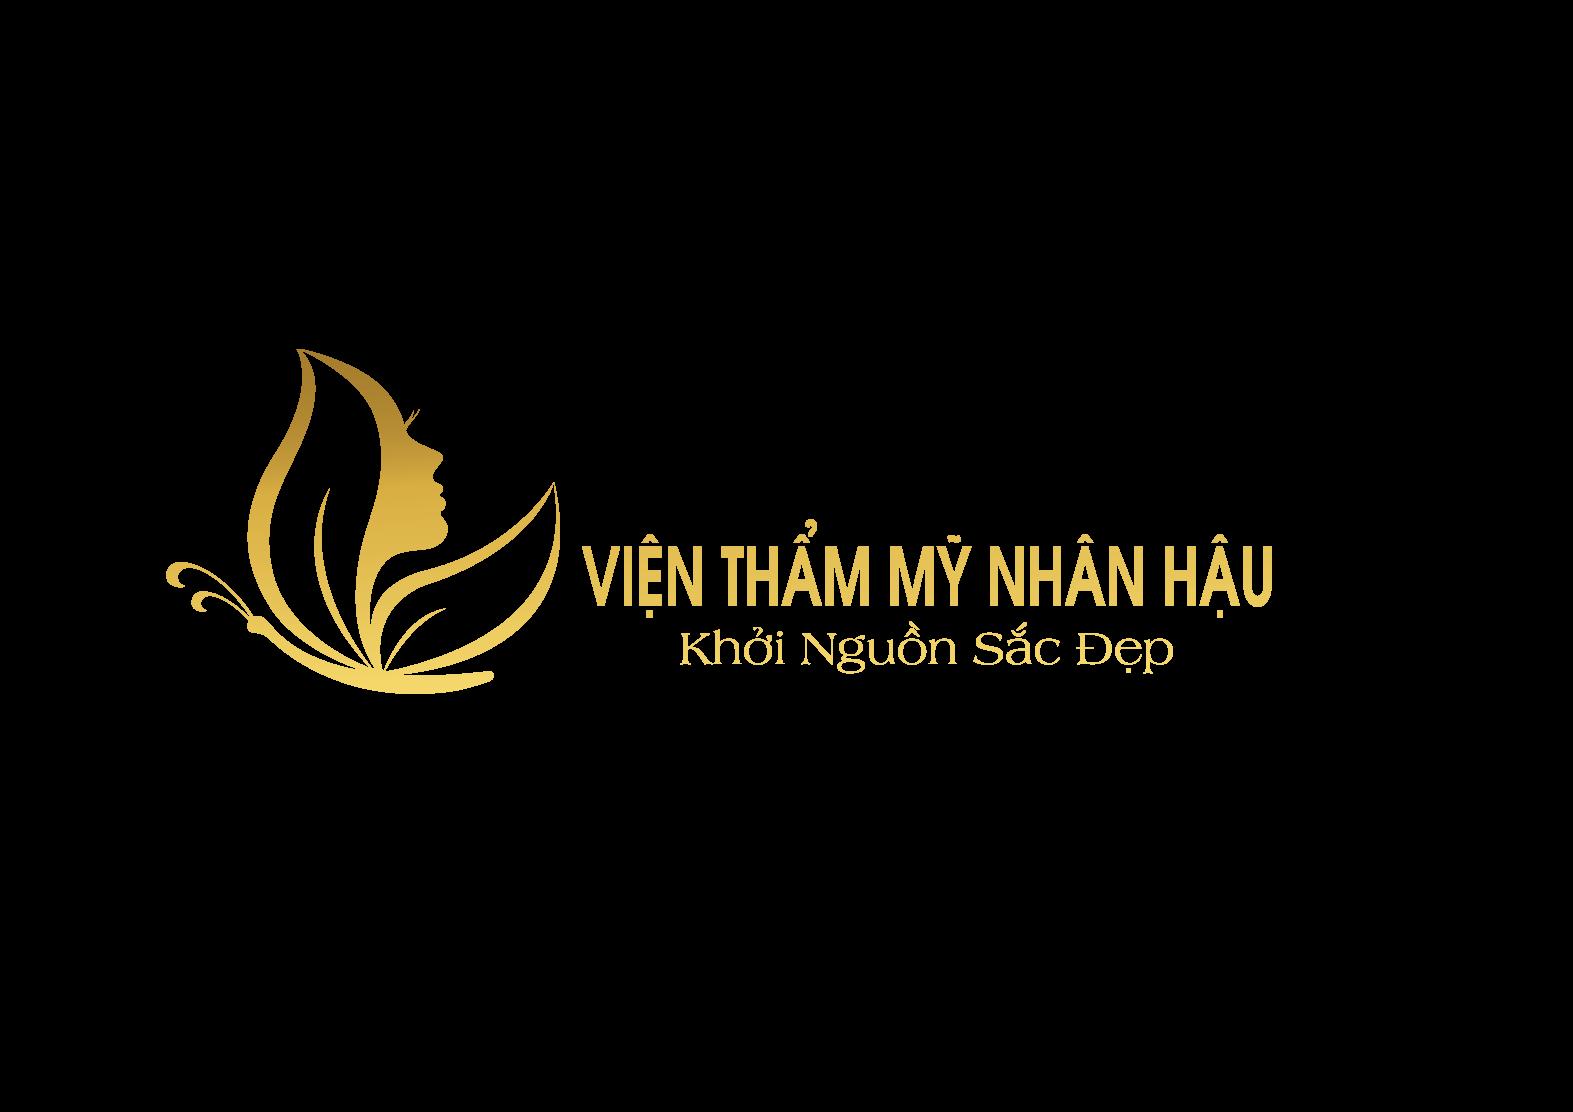 Tham My Nhan Hau